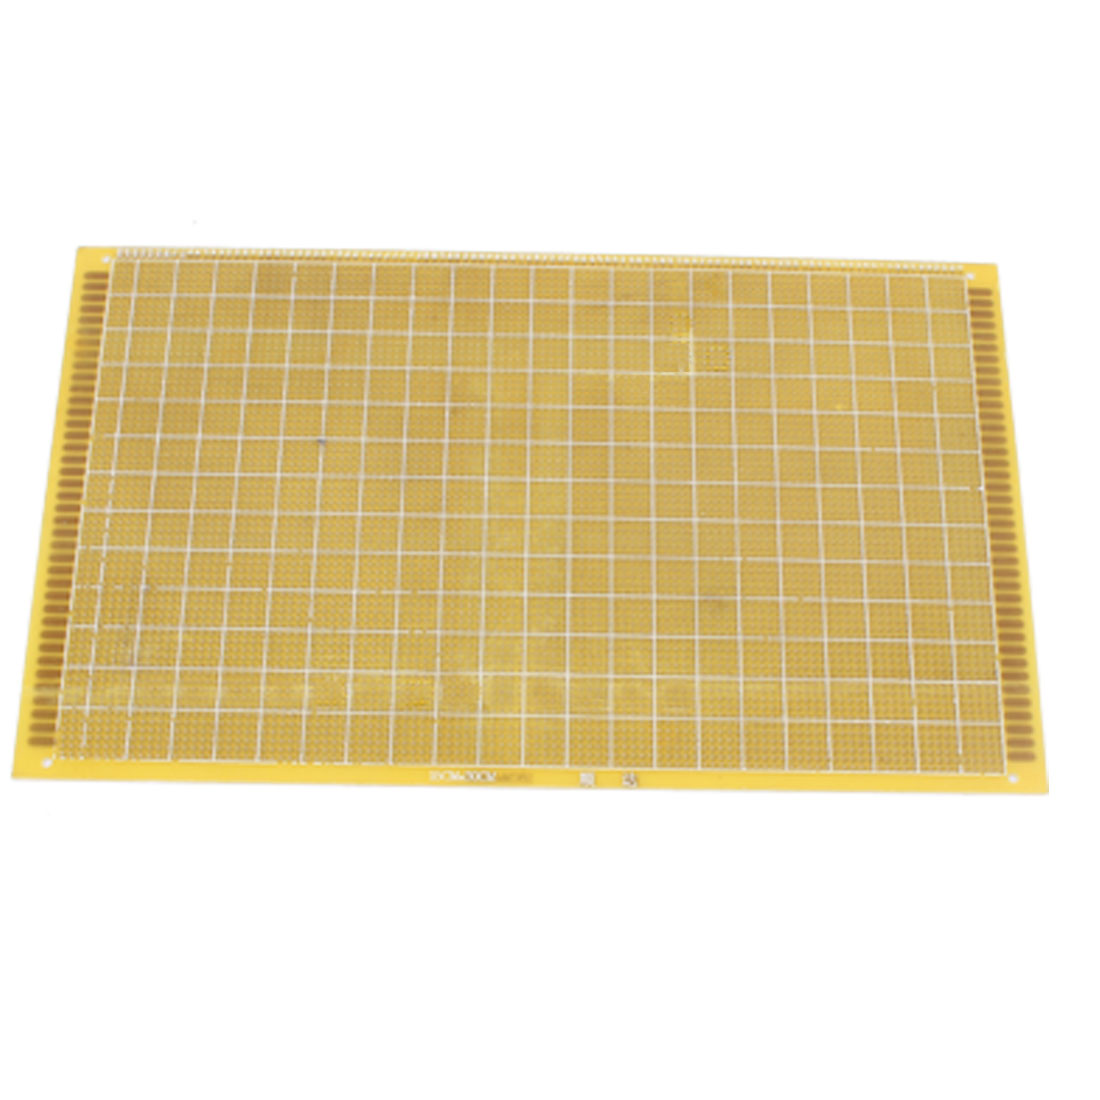 Prototyping PCB Printed Circuit Board Prototype Breadboard 30cm x 18cm